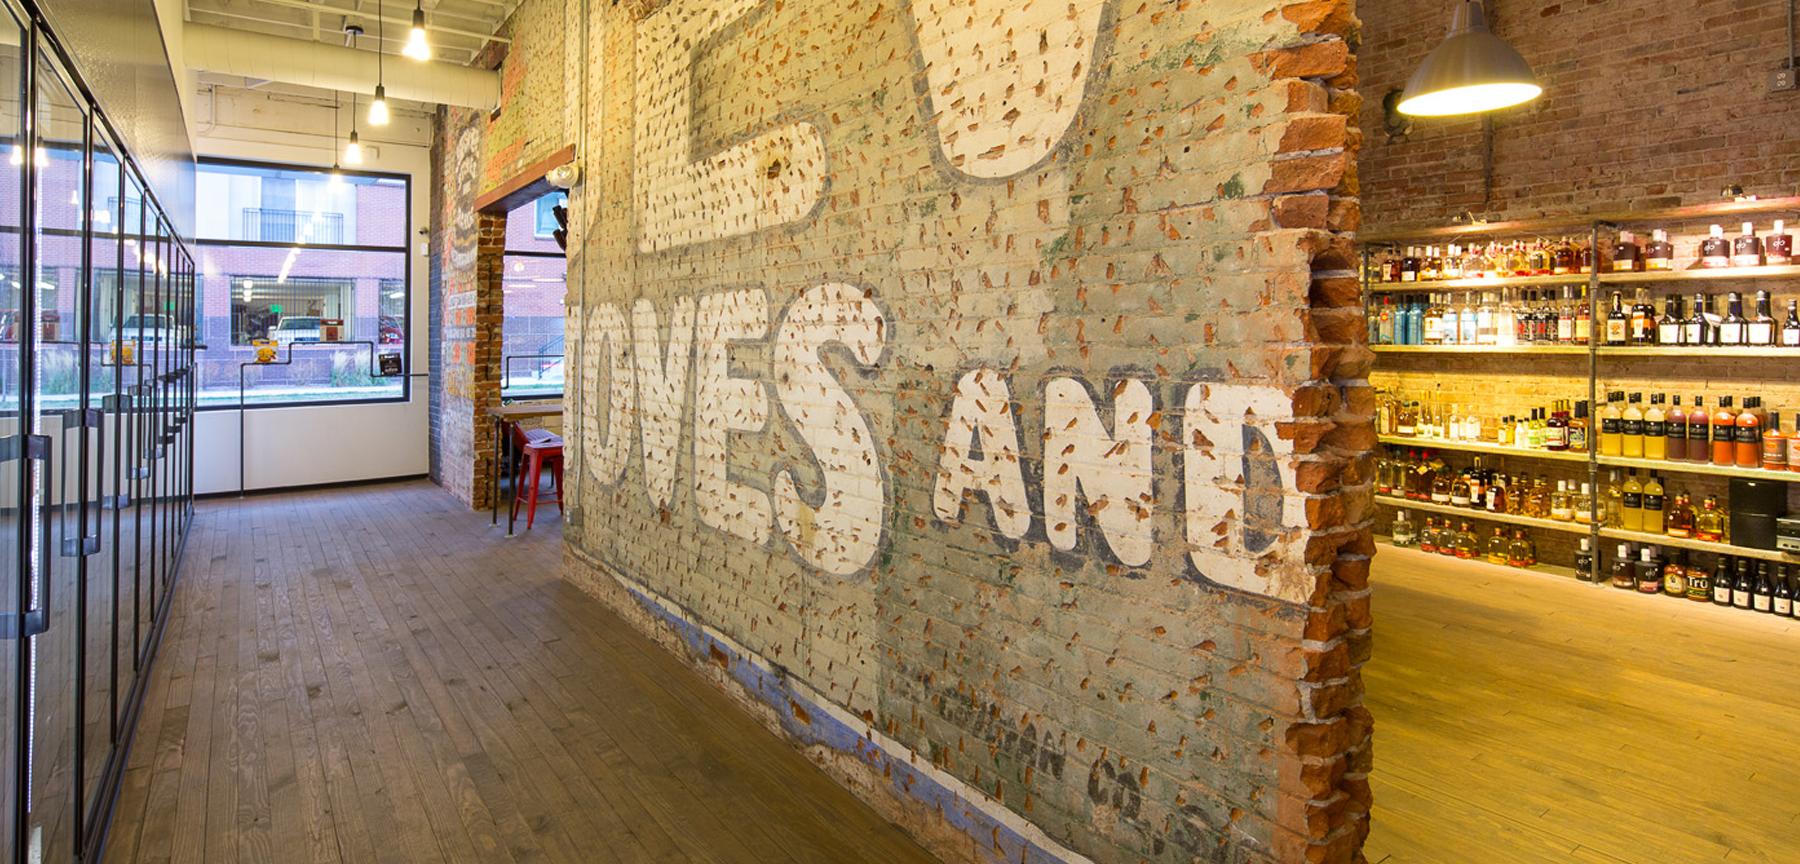 Hugo's Colorado Beer and Spirits coolers and brick wall